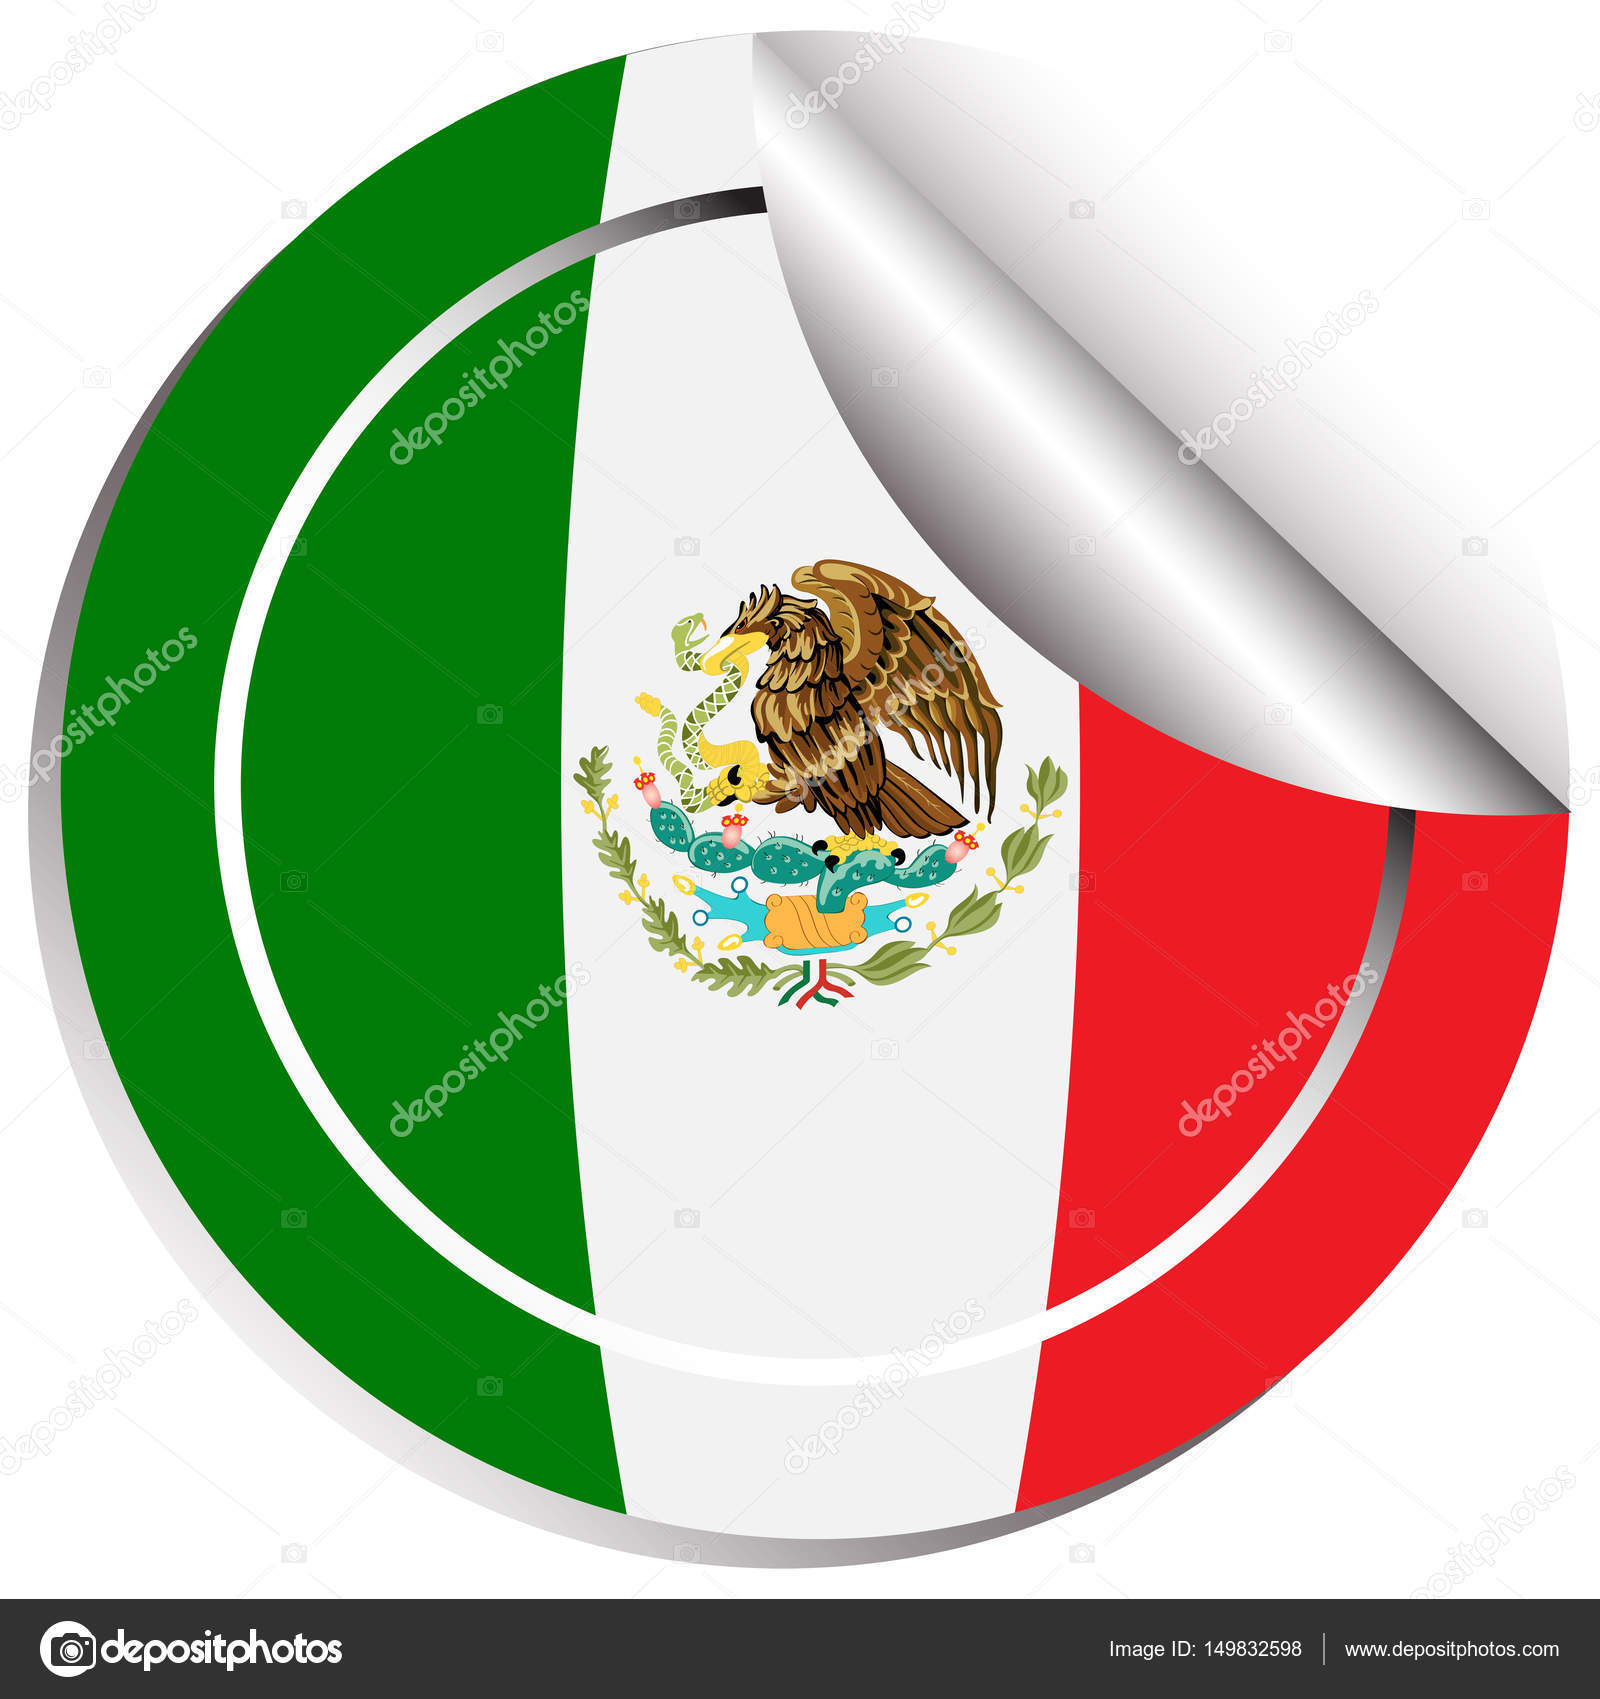 Mexiko Fahne Aufkleber Design — Stockvektor © interactimages #149832598